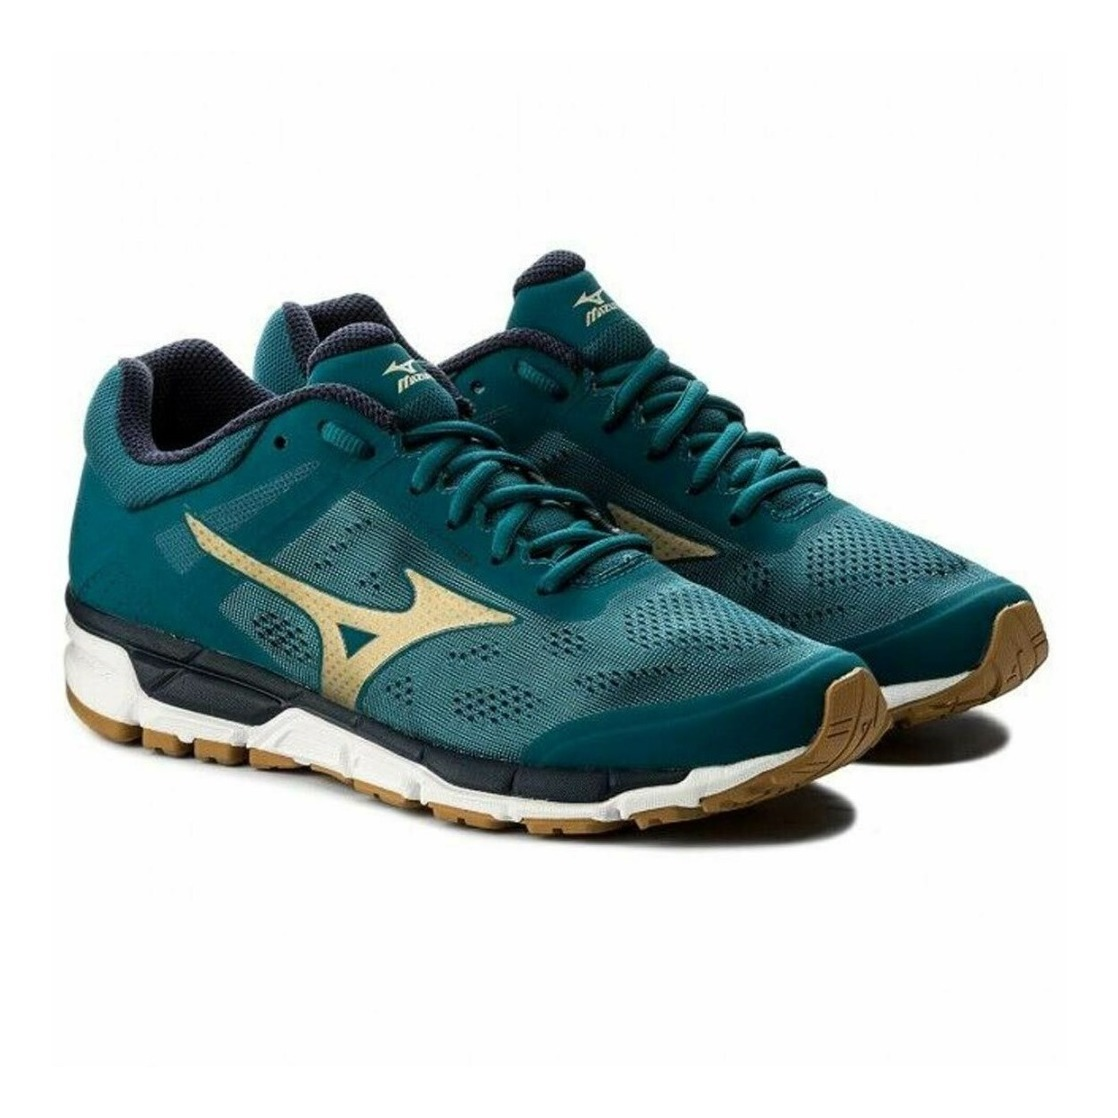 mizuno synchro mx 2 women's running shoes argentina